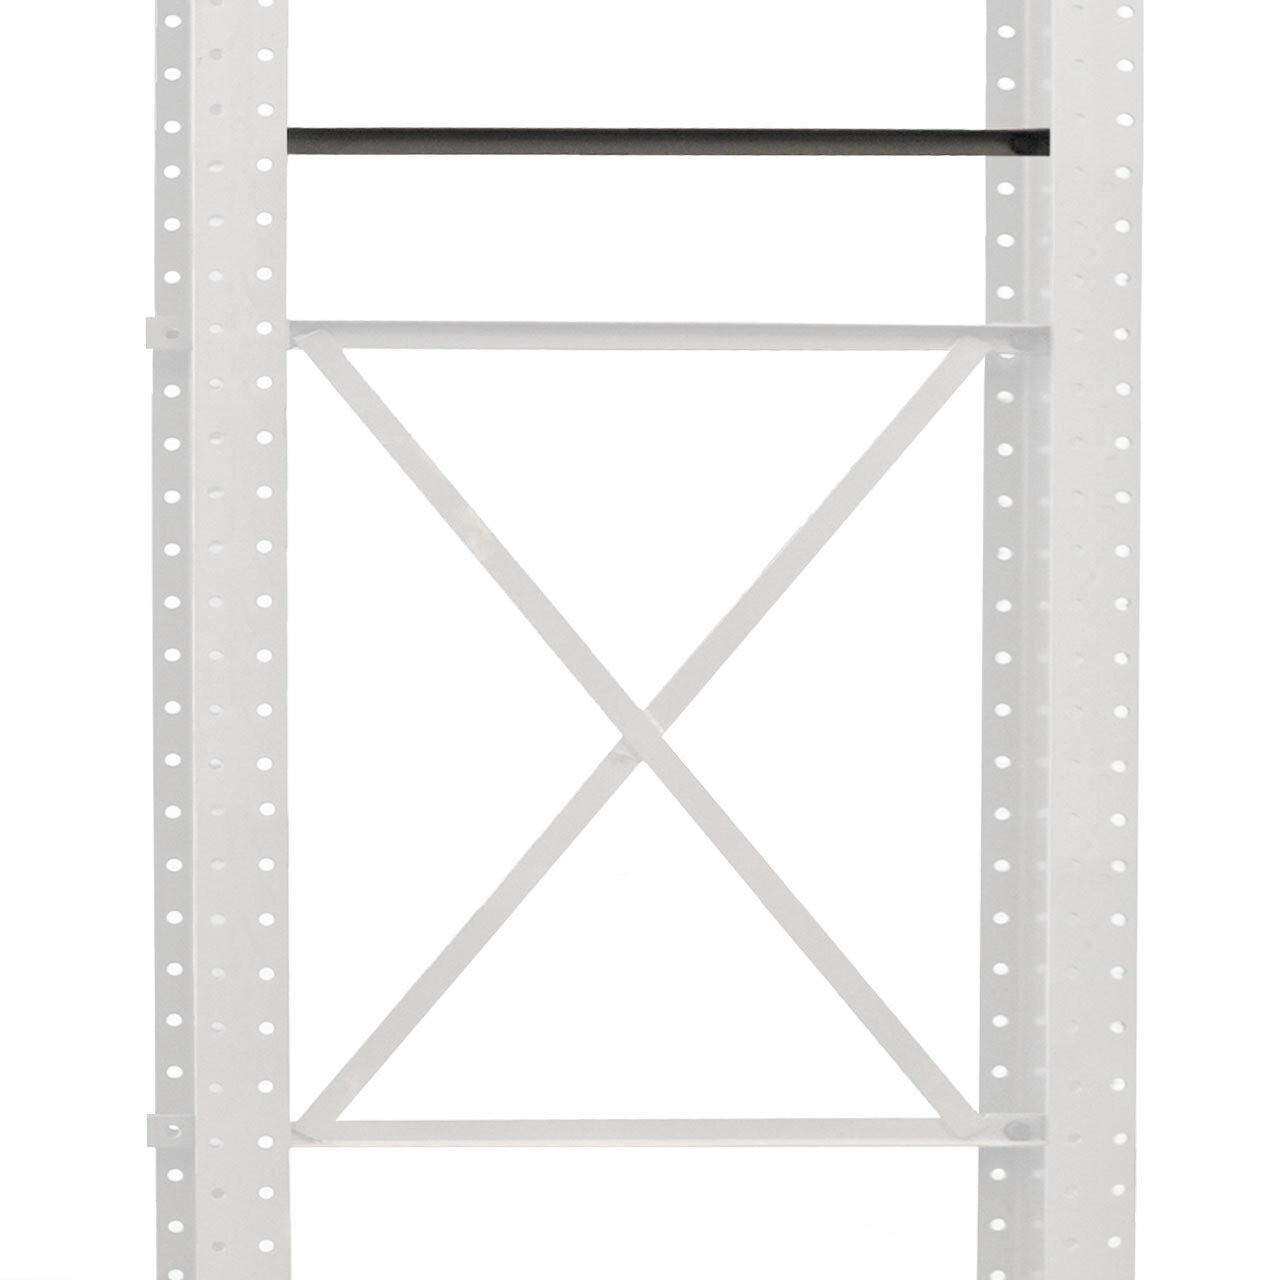 Horizontal brace for cantilever racking